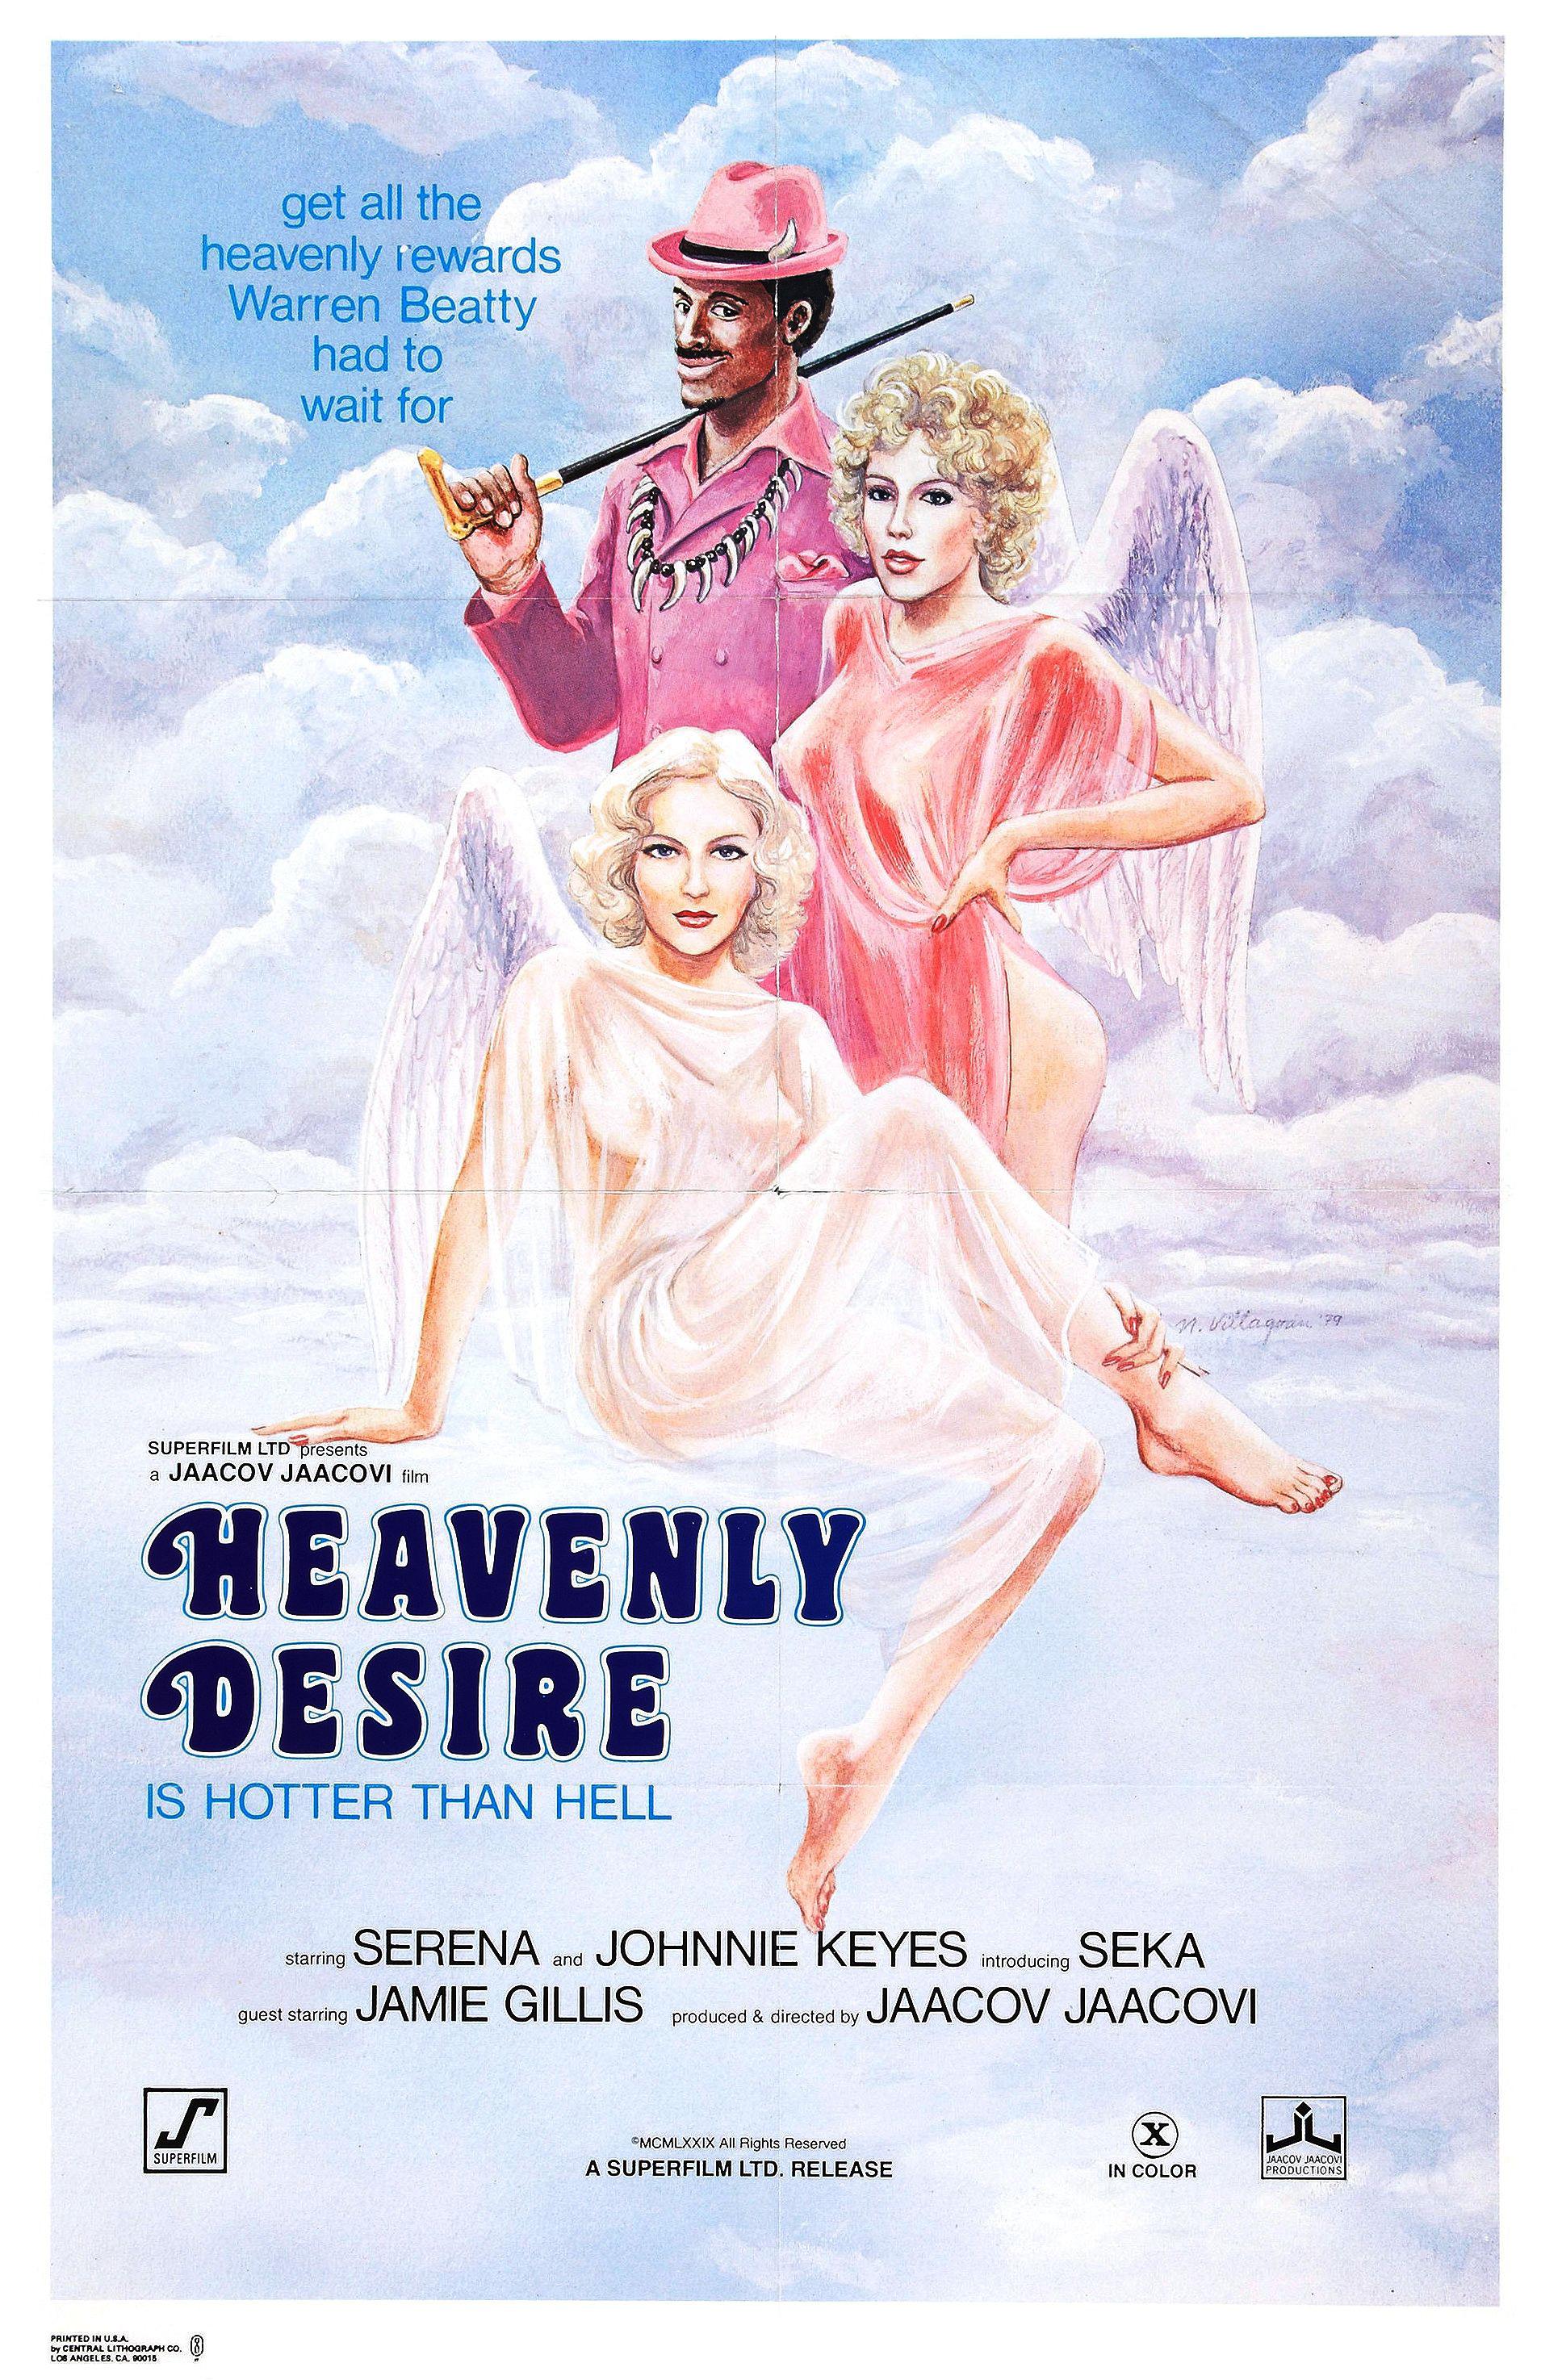 1979 Porn Movies vintage adult film posters - gallery